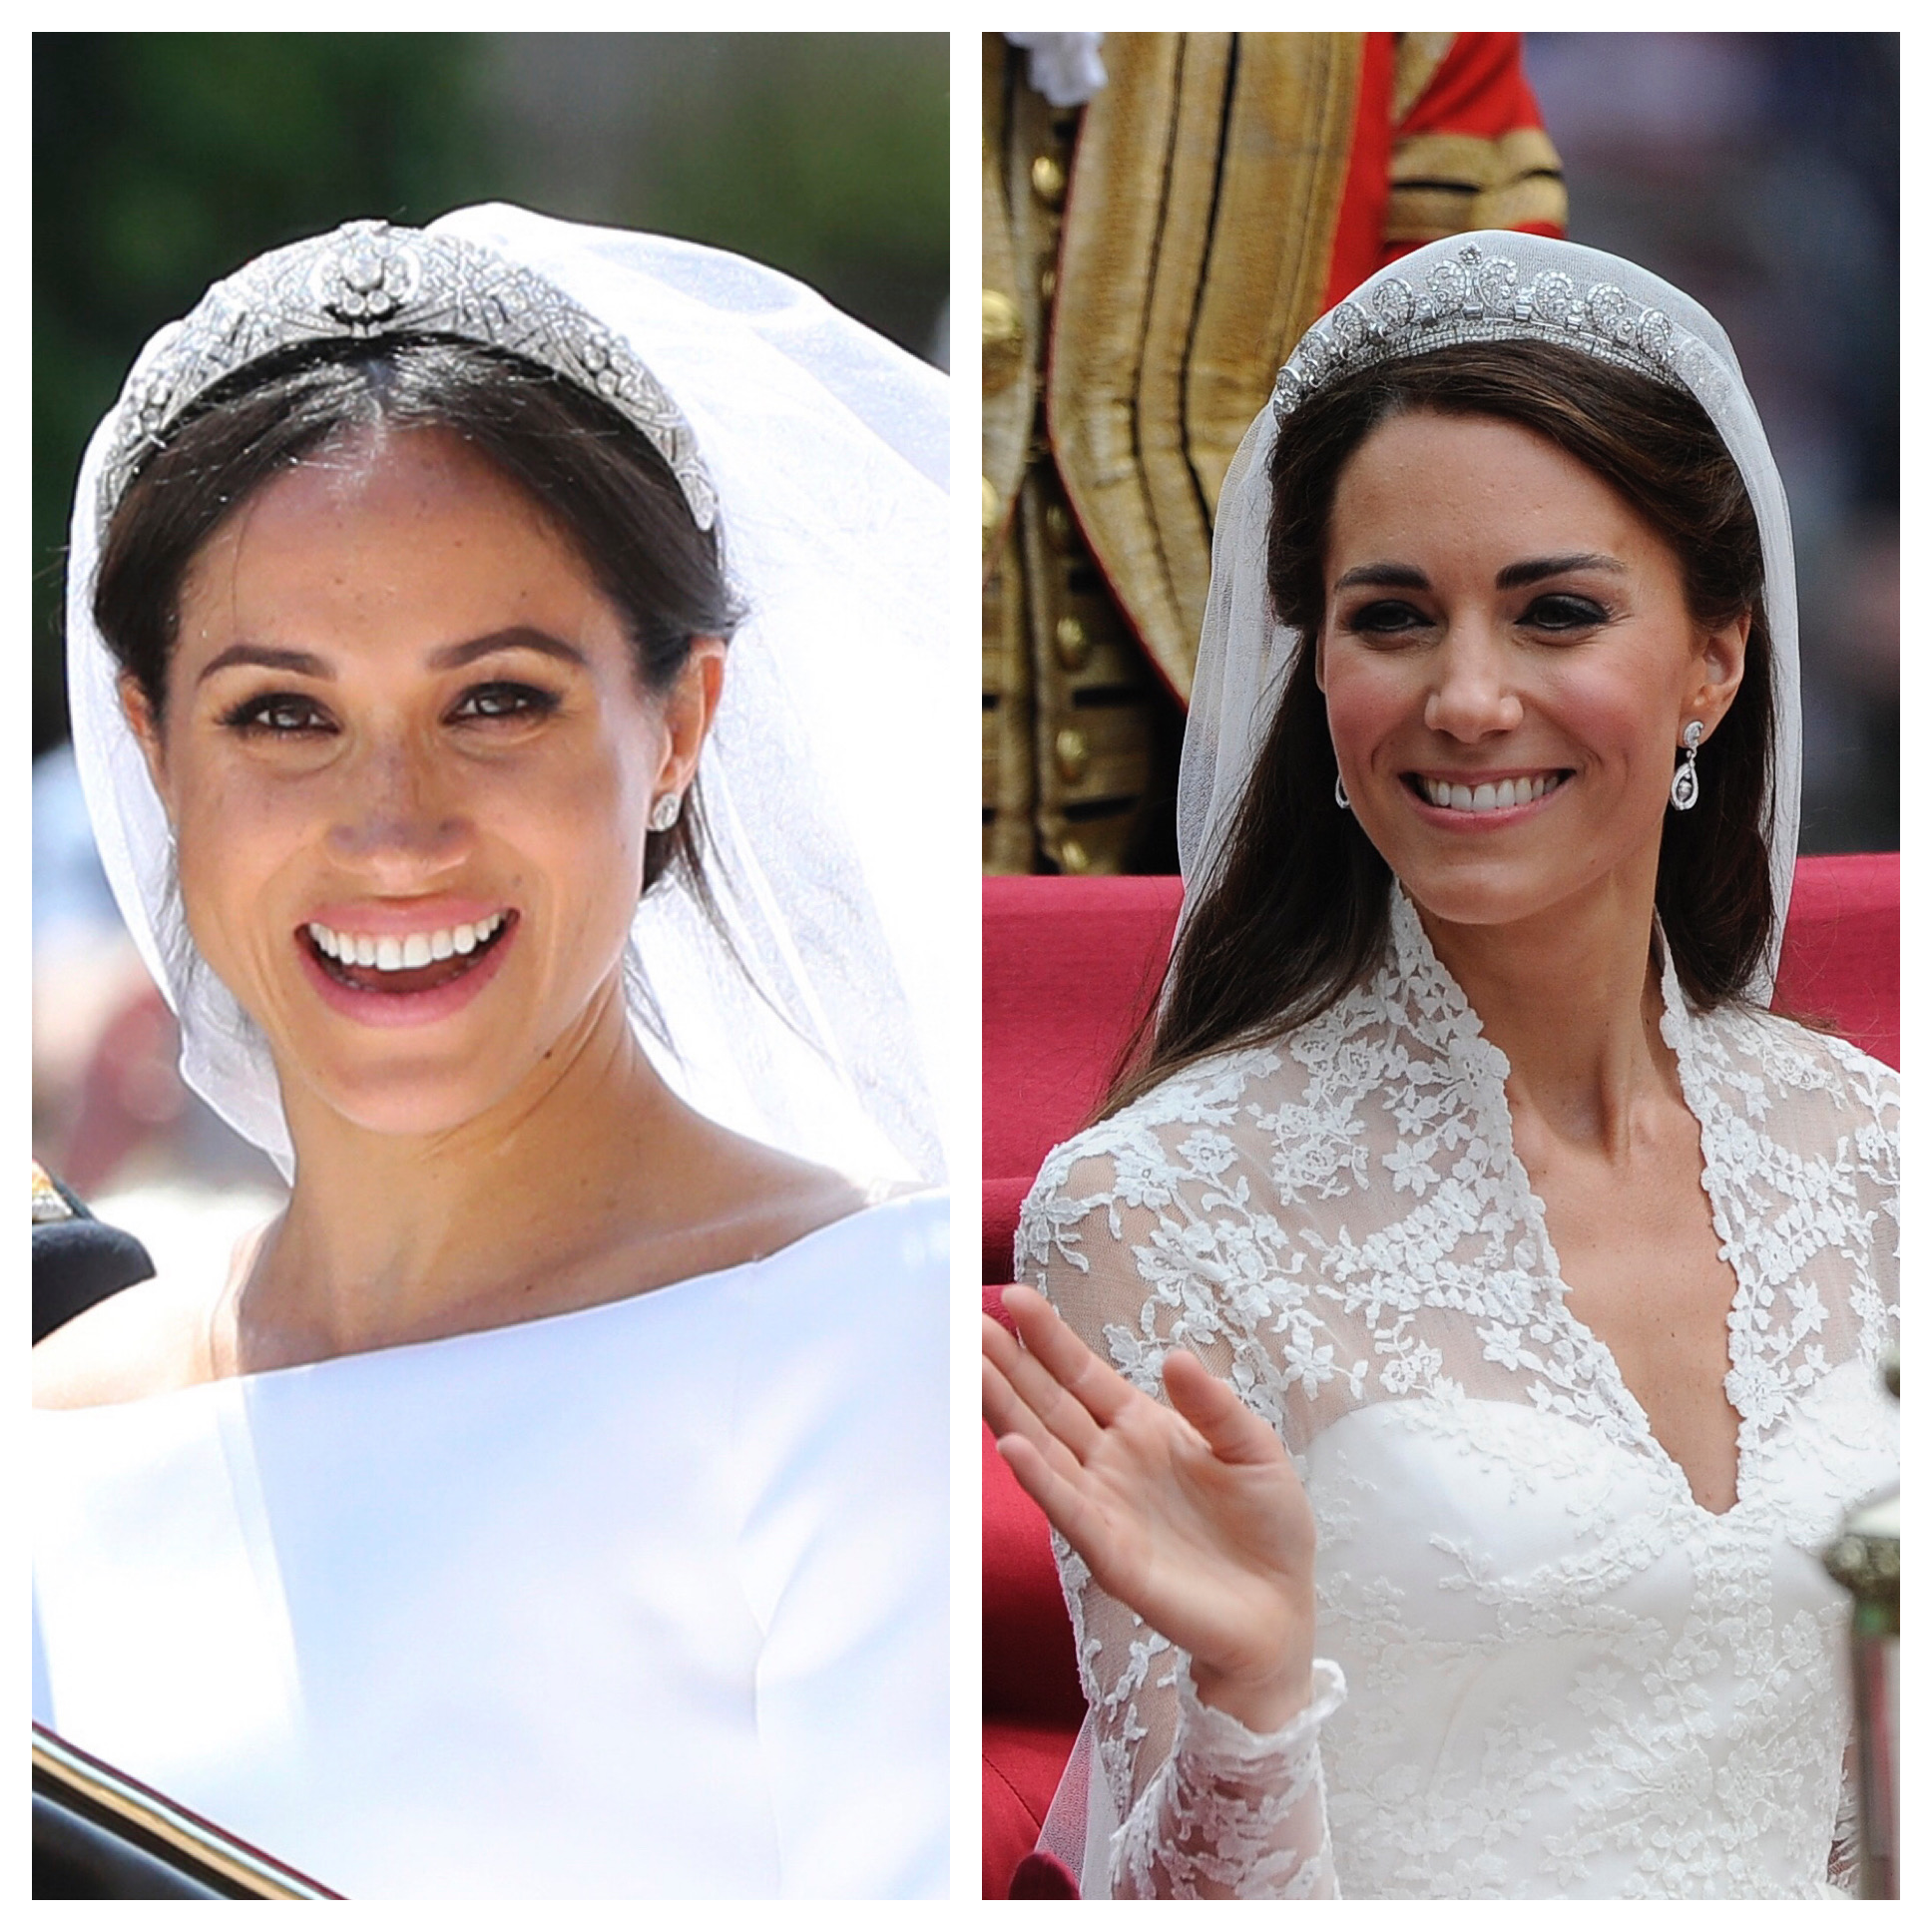 A Brief History of Princess Beatrice's Wedding Tiara